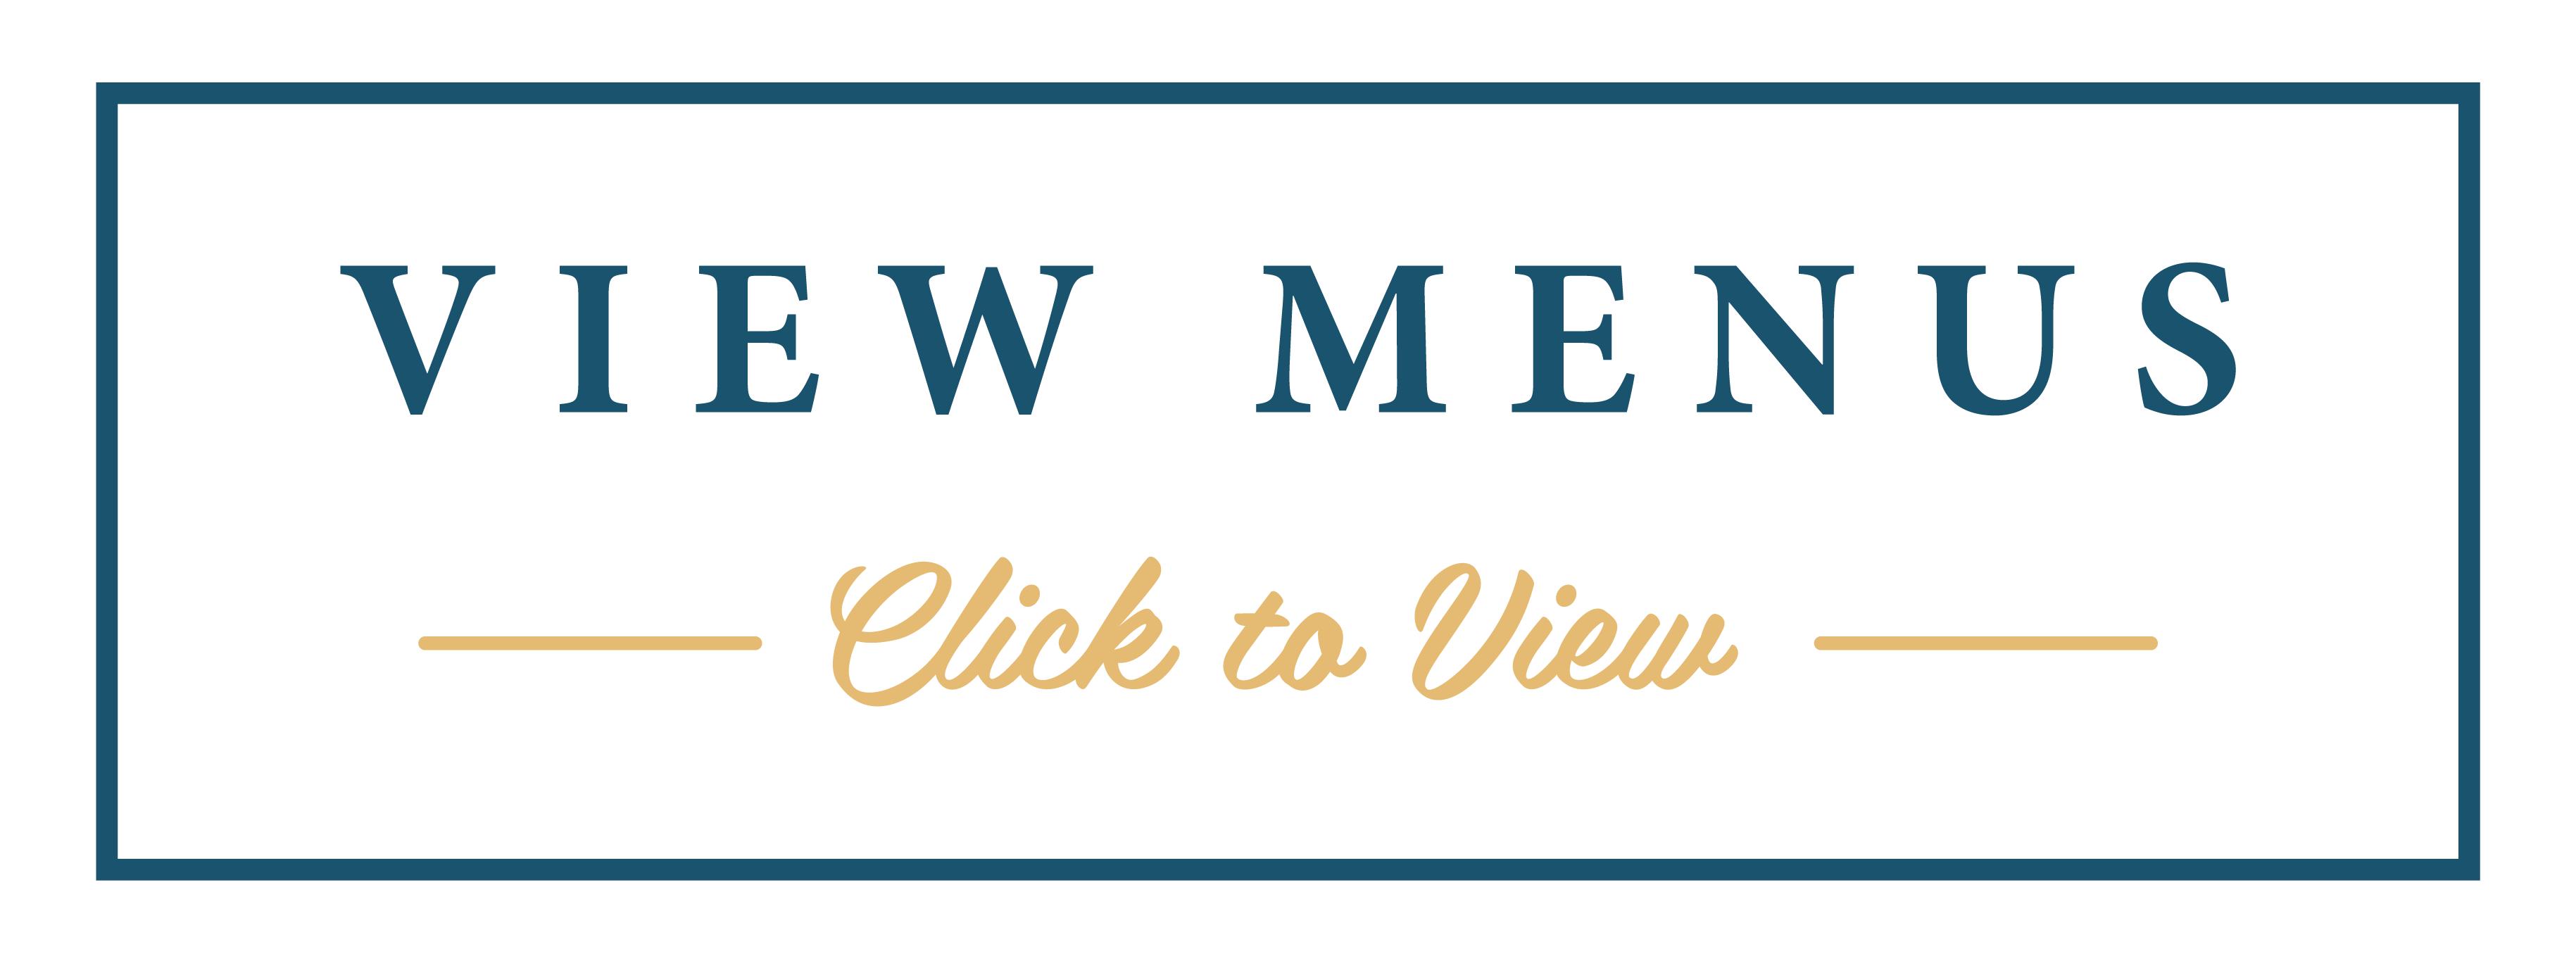 melange menus Icon